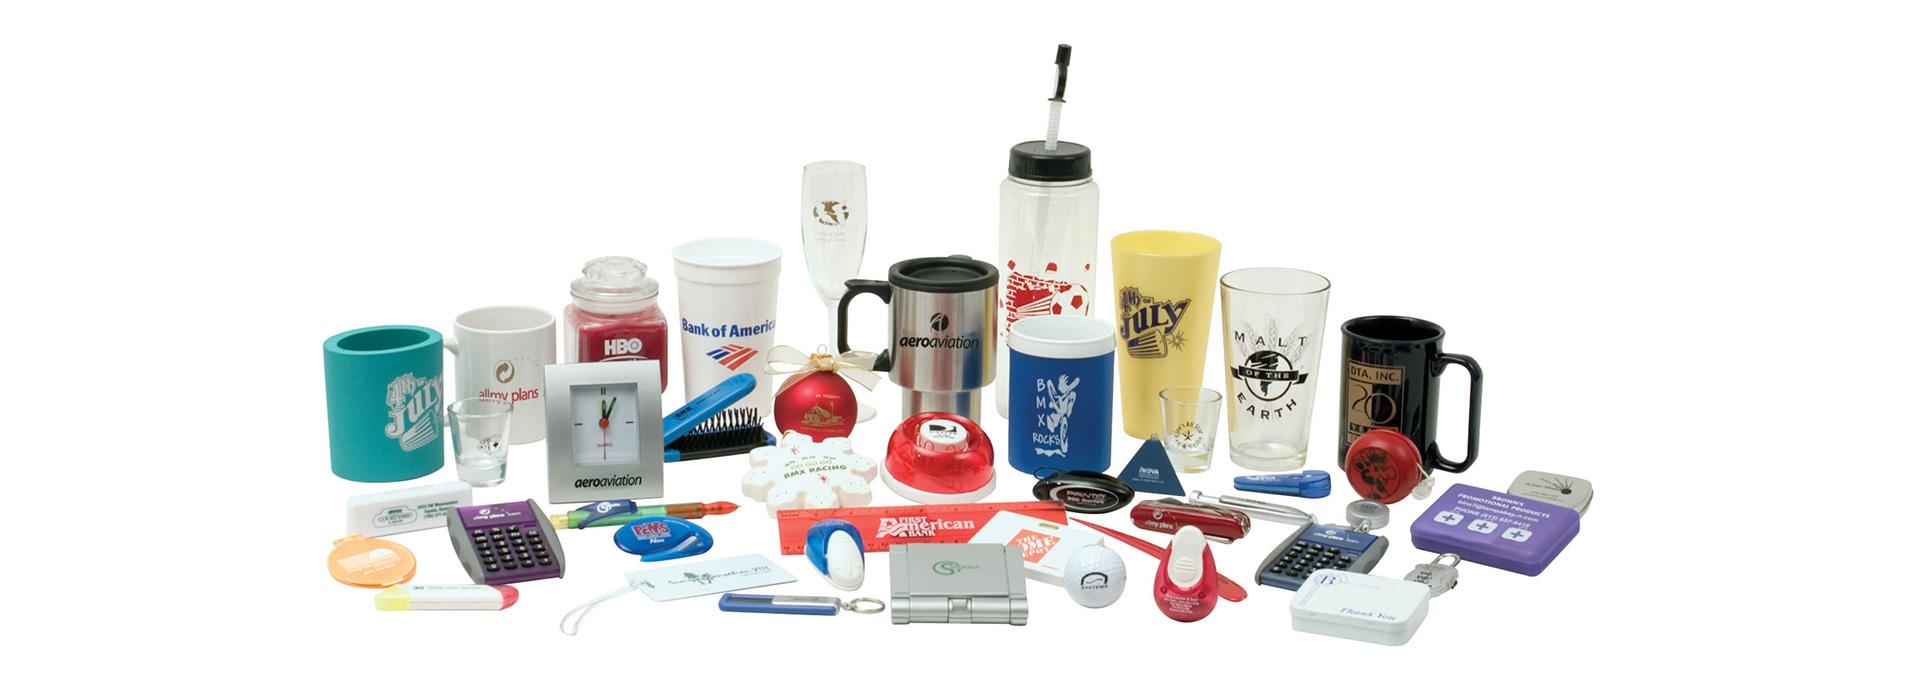 Corporate Premium Gifts